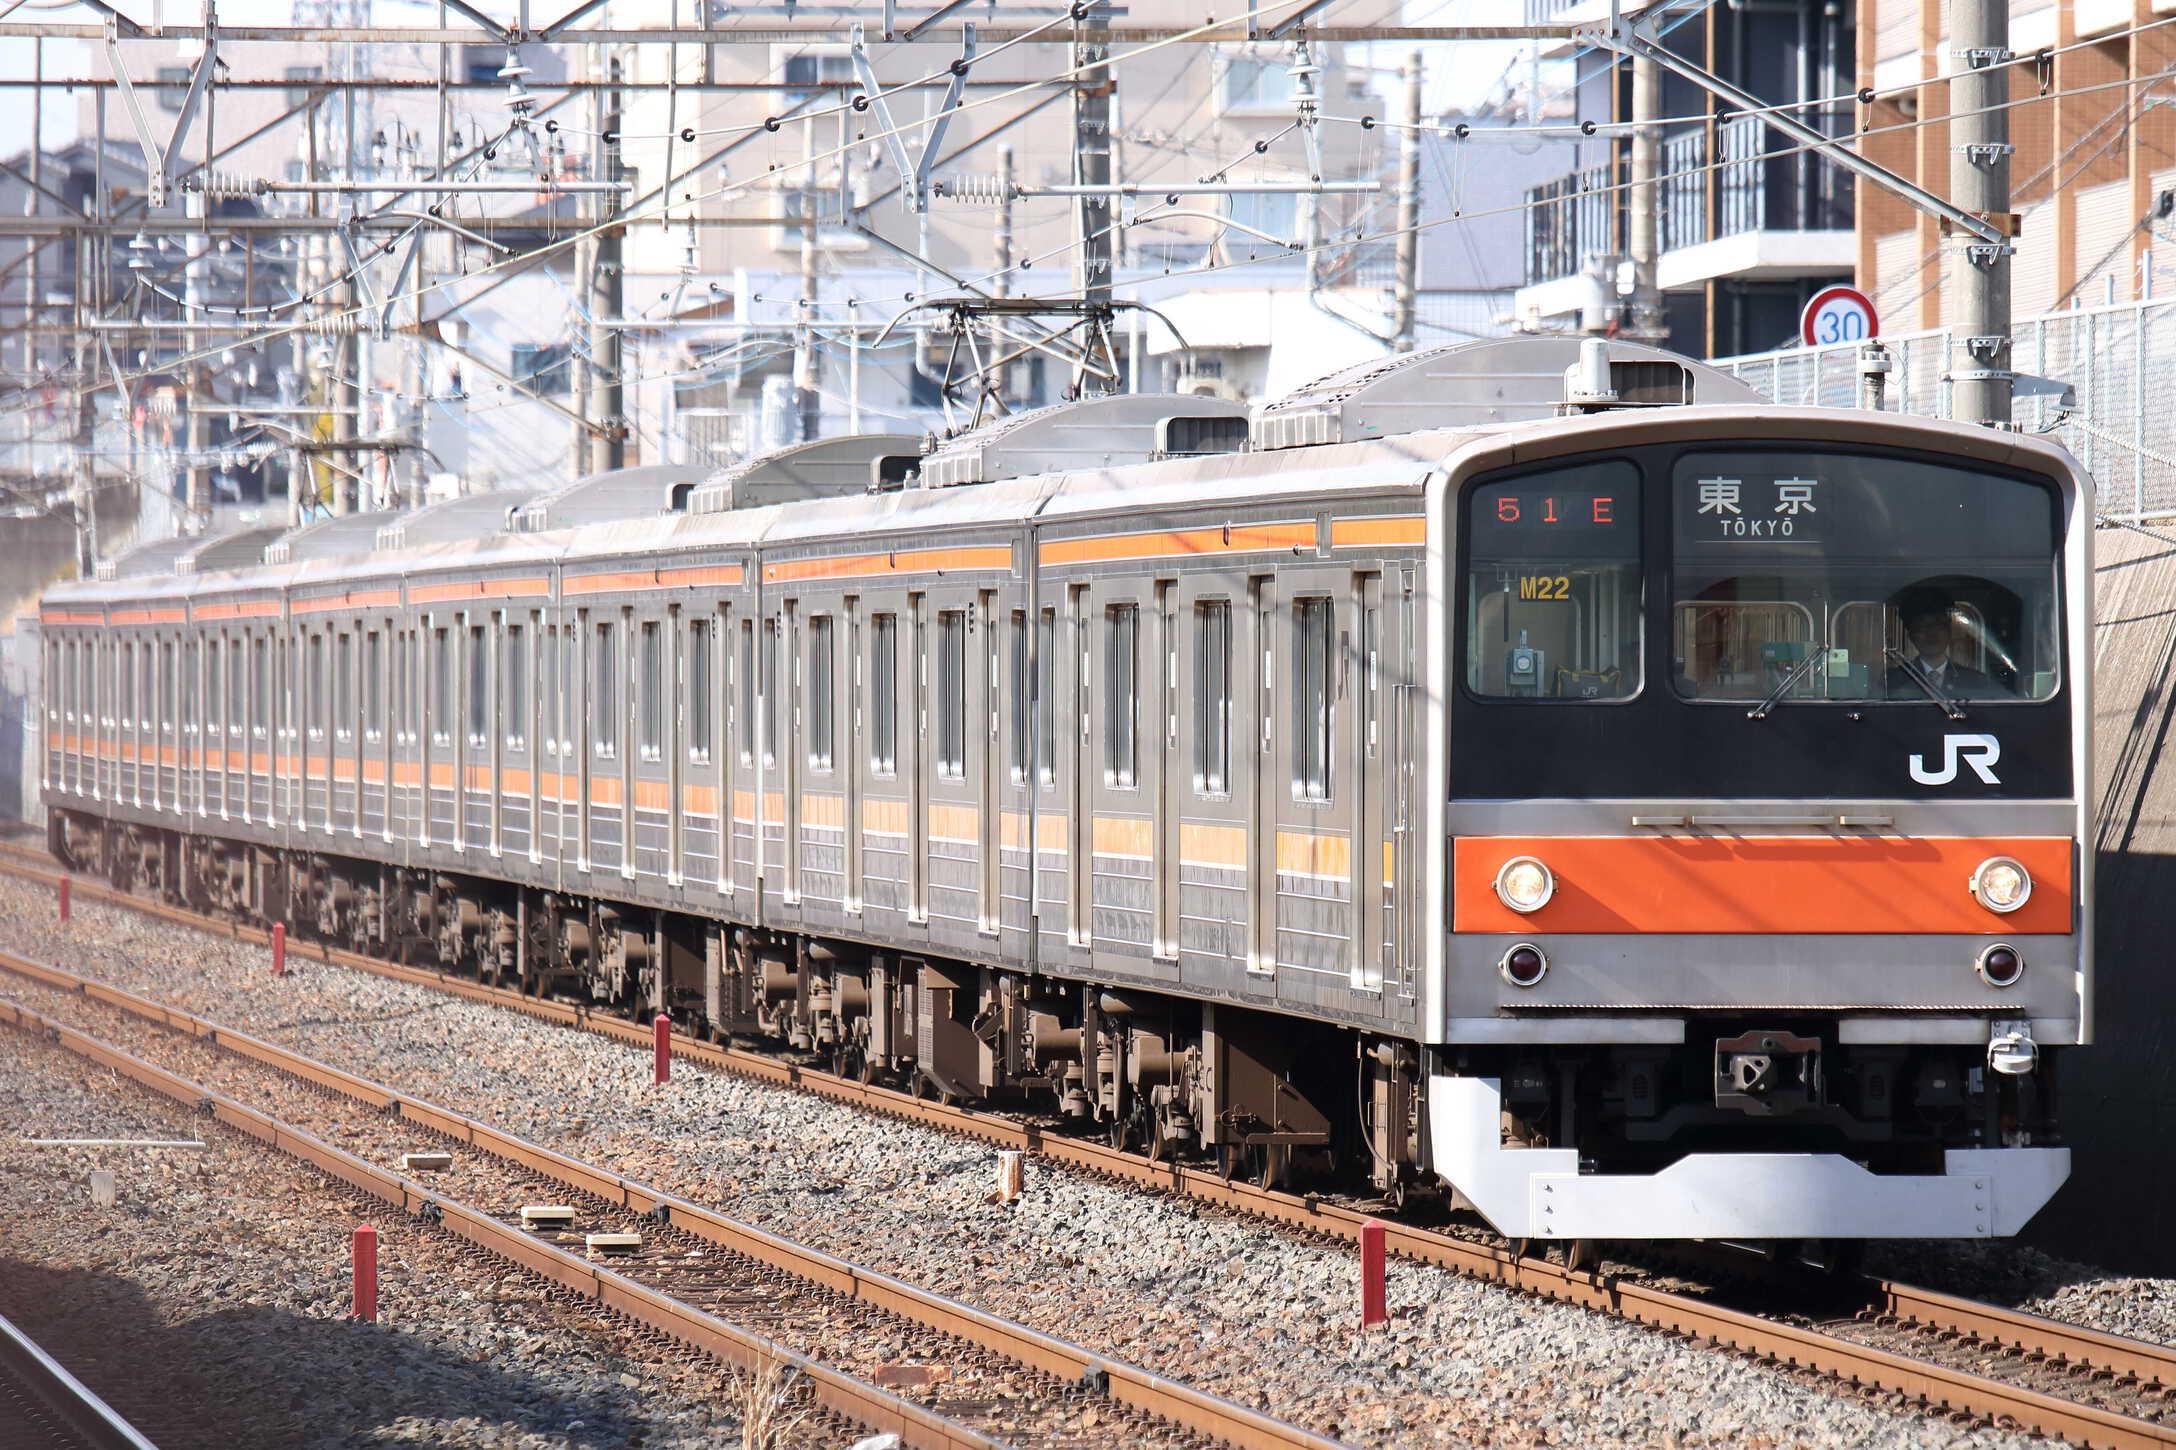 951E 205系 千ケヨM22編成